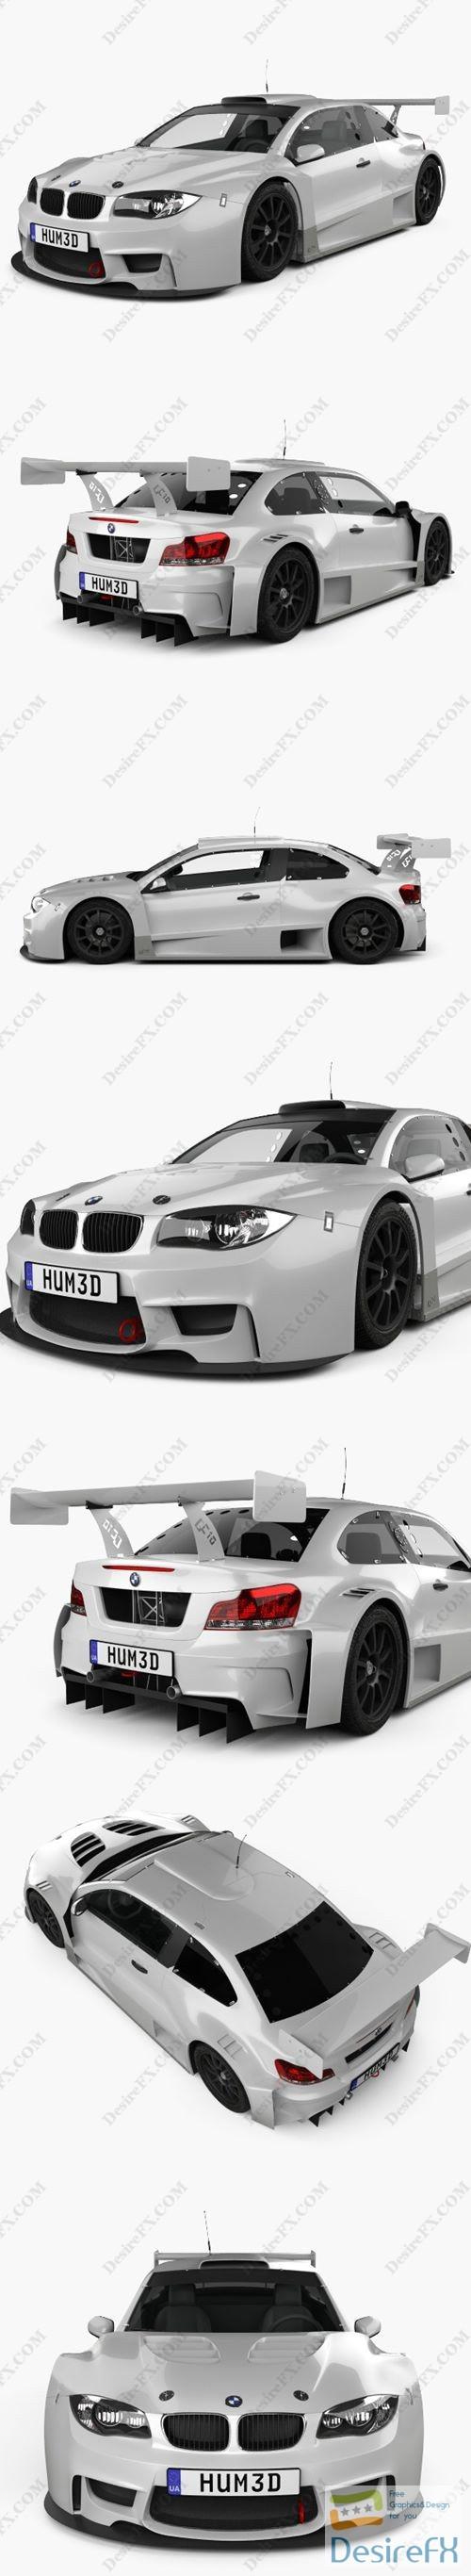 BMW M1 GC10-V8 coupe 2011 3D Model